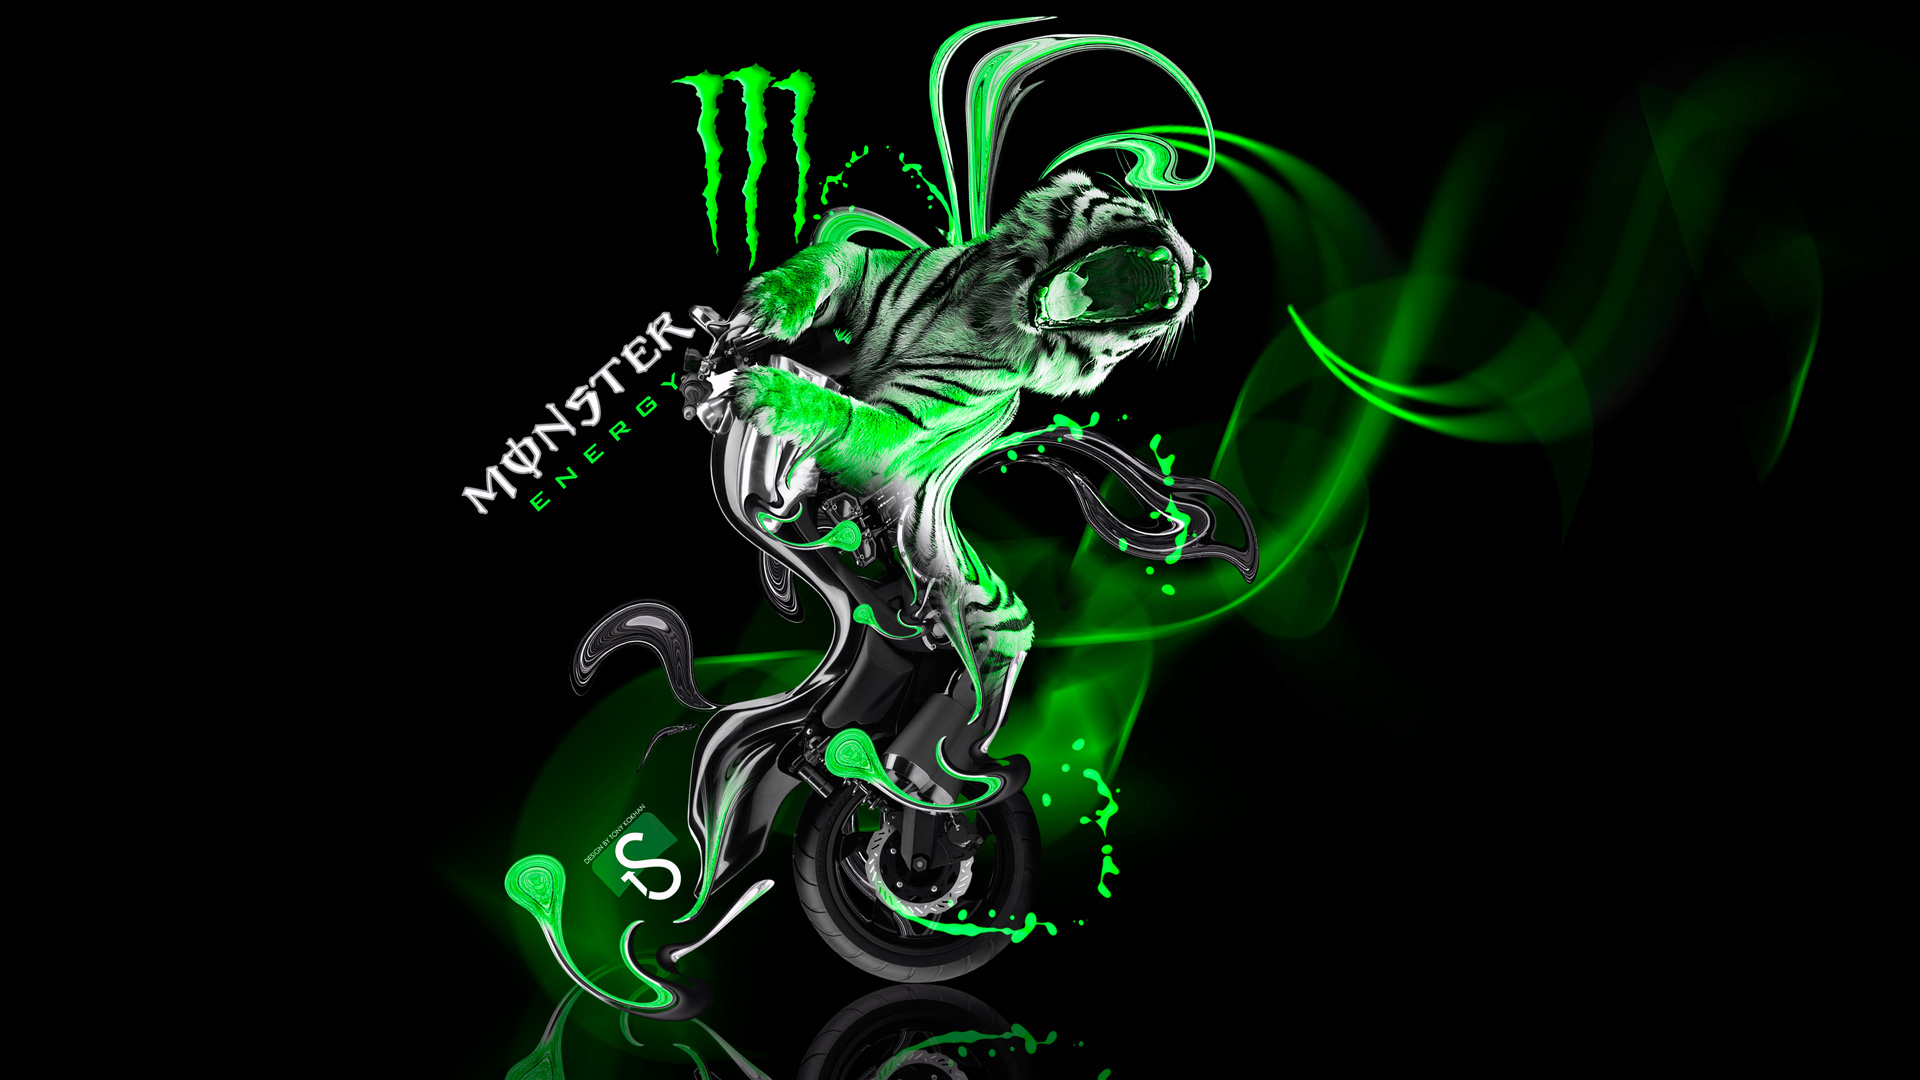 Hd Wallpaper Car And Bike Download Monster Energy Wallpaper Hd Pixelstalk Net